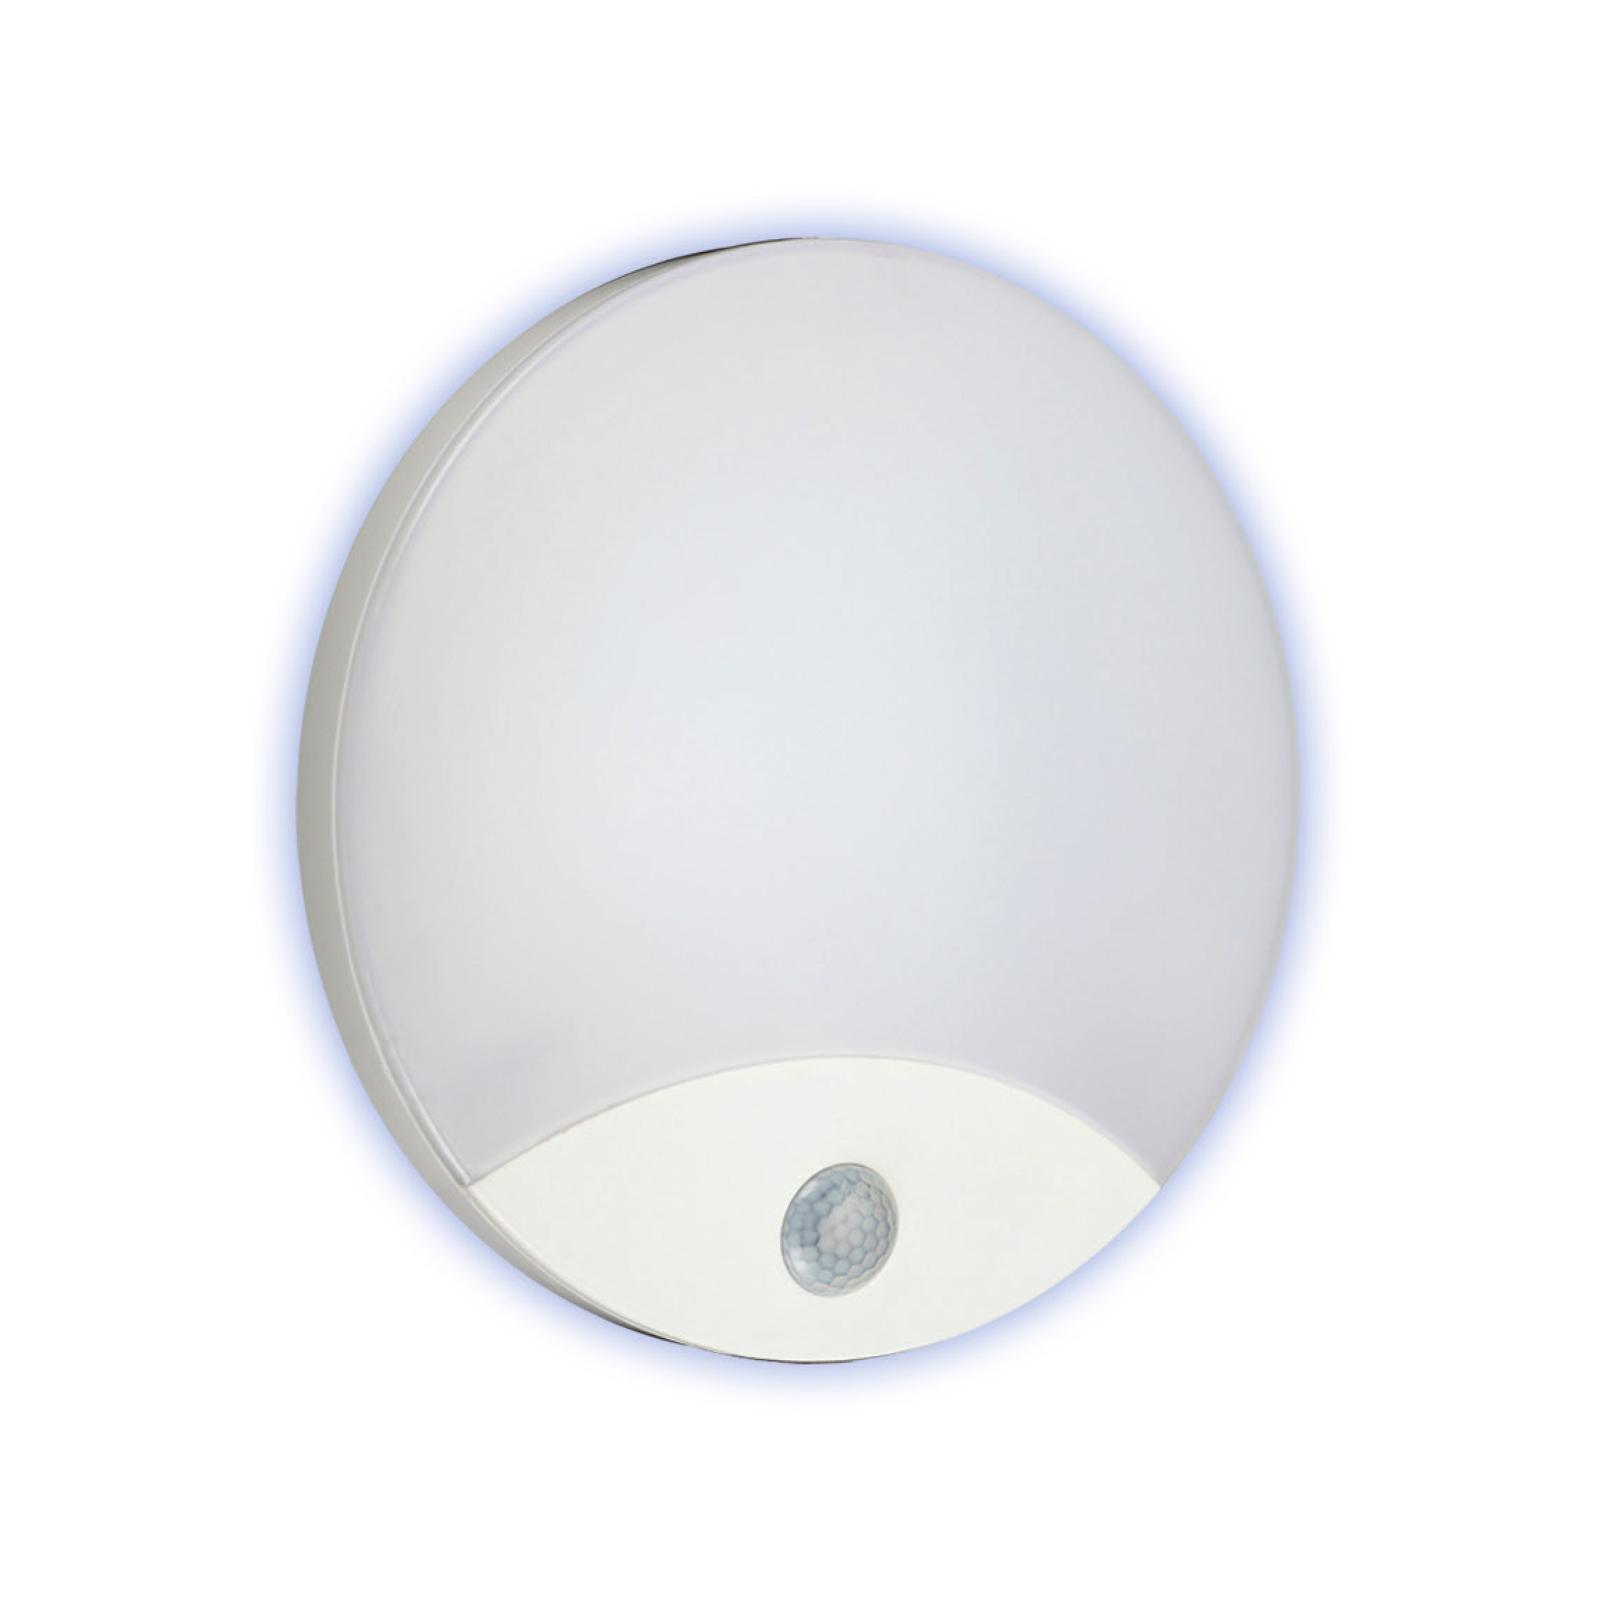 Lampada da parete Lampada da soffitto plafoniera lampada parete lampada muro